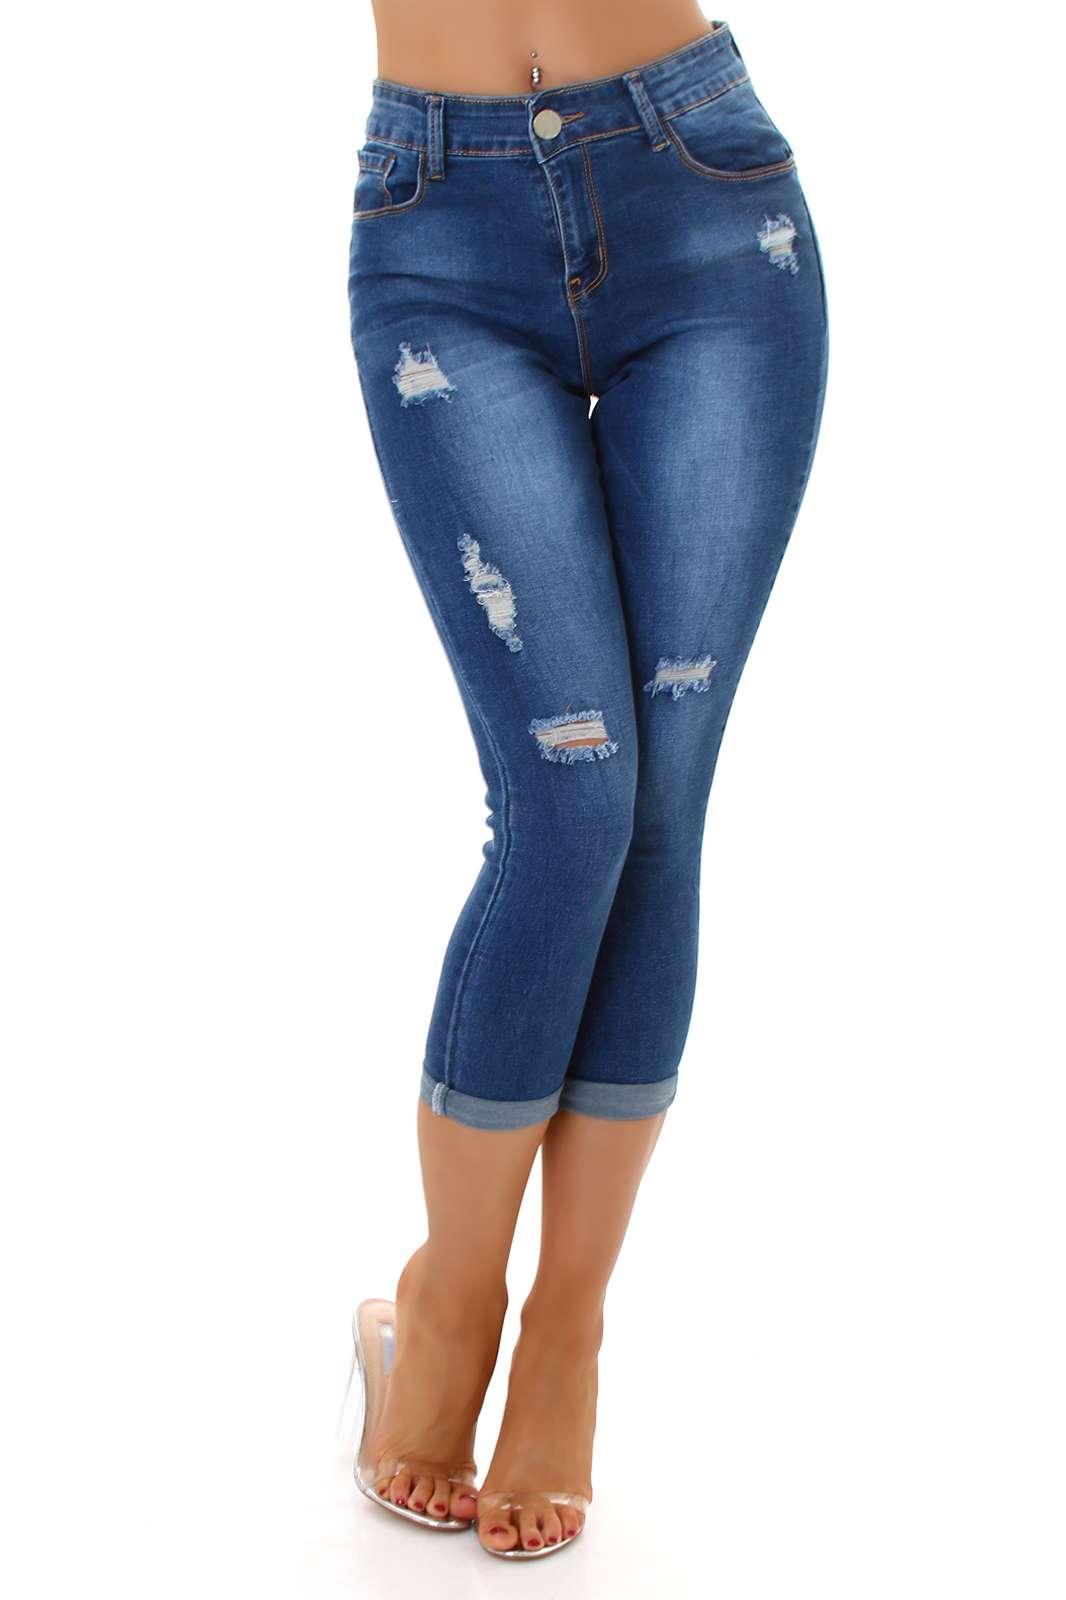 Jeans High Waist Laria